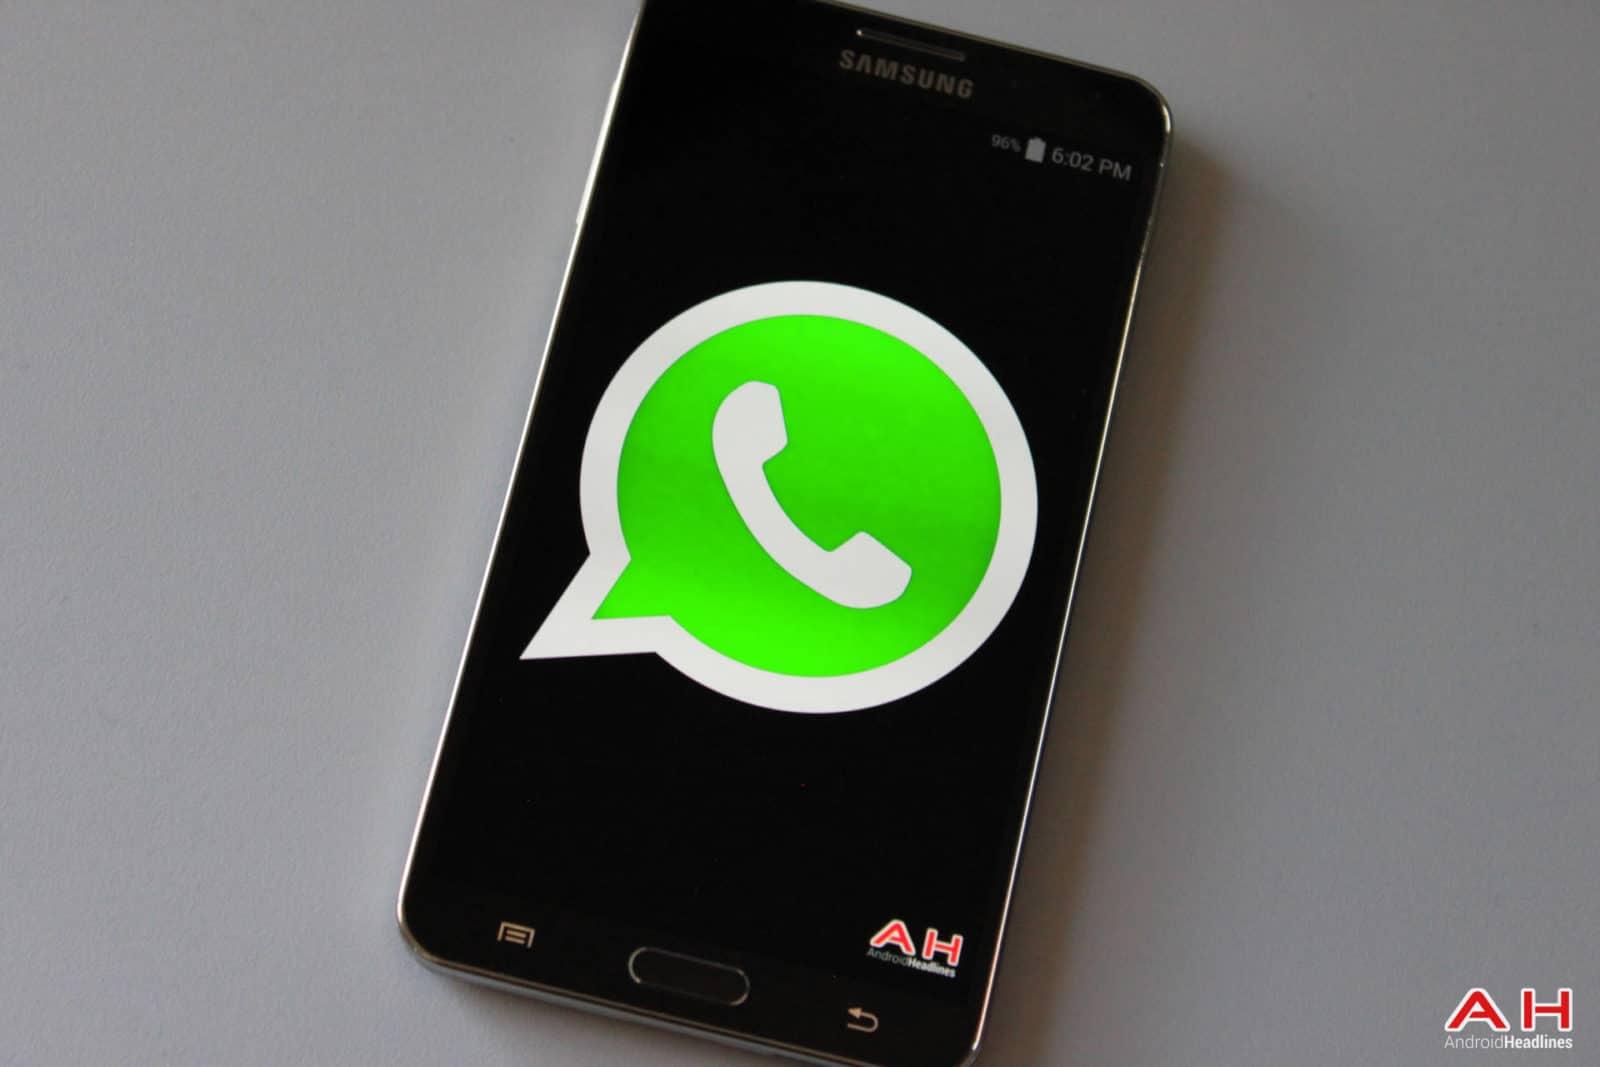 AH whatsapp 1.0